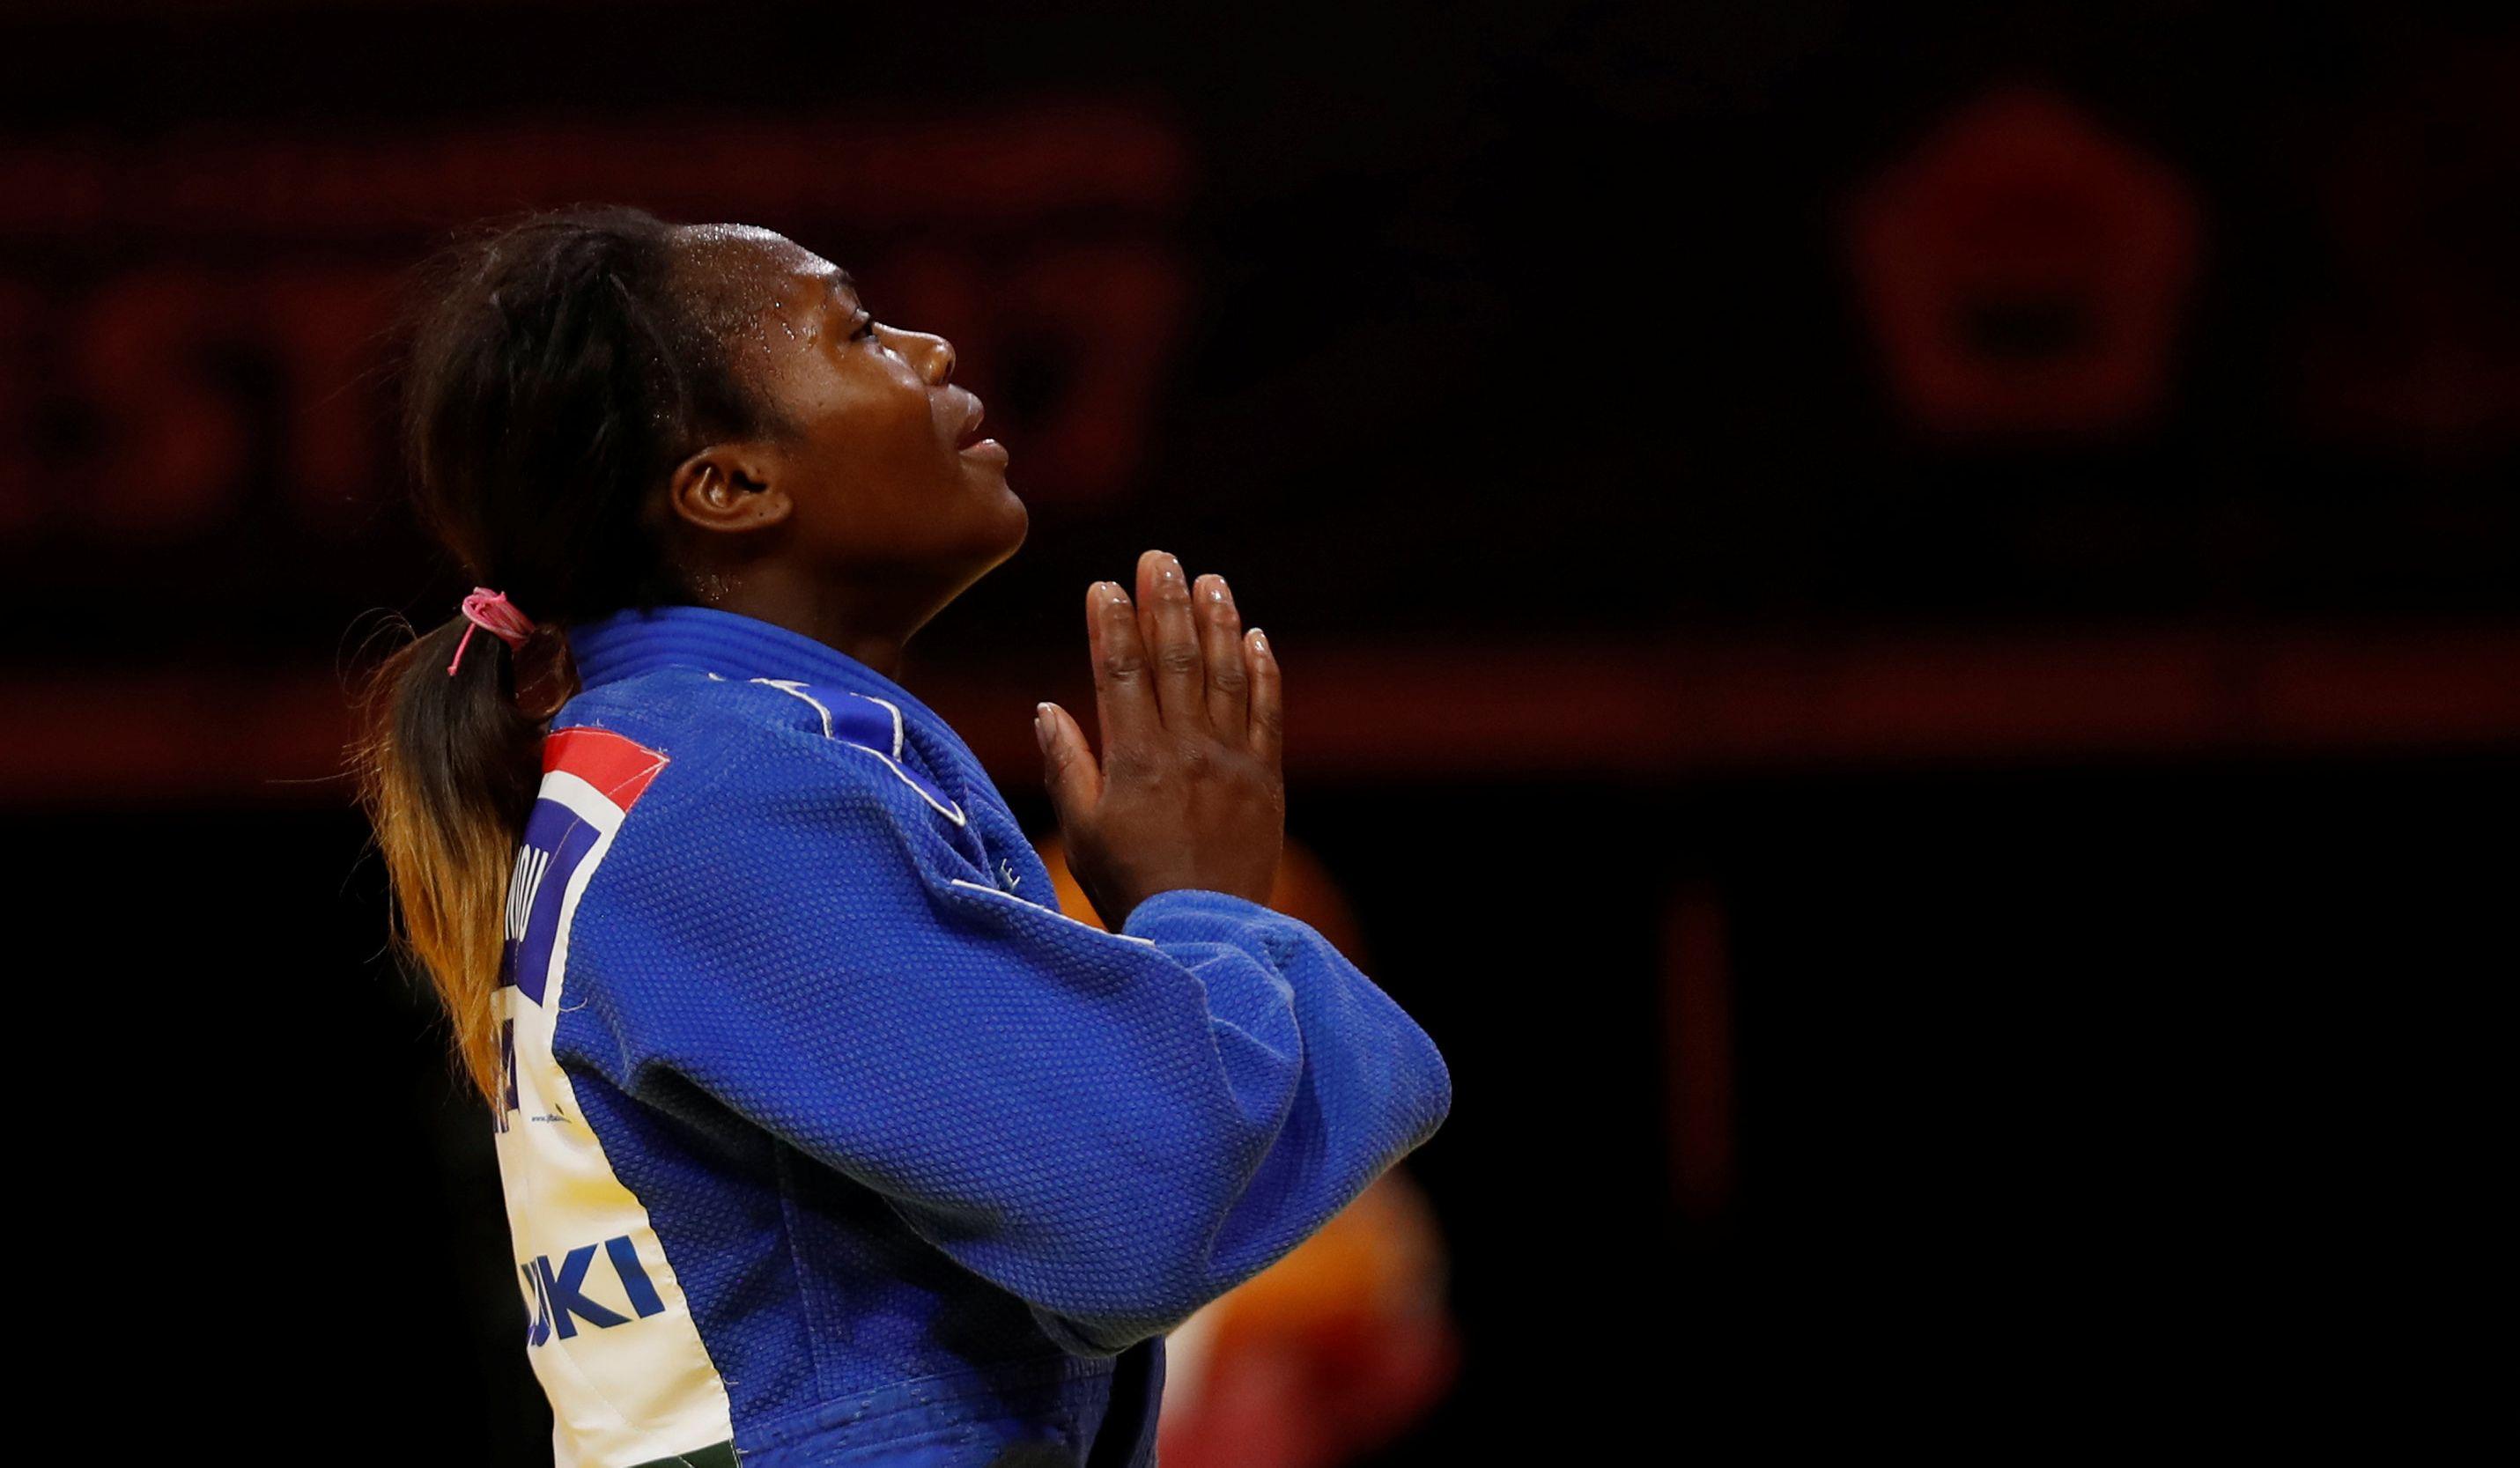 Judo - Clarisse Agbegnenou, la triple couronne mondiale